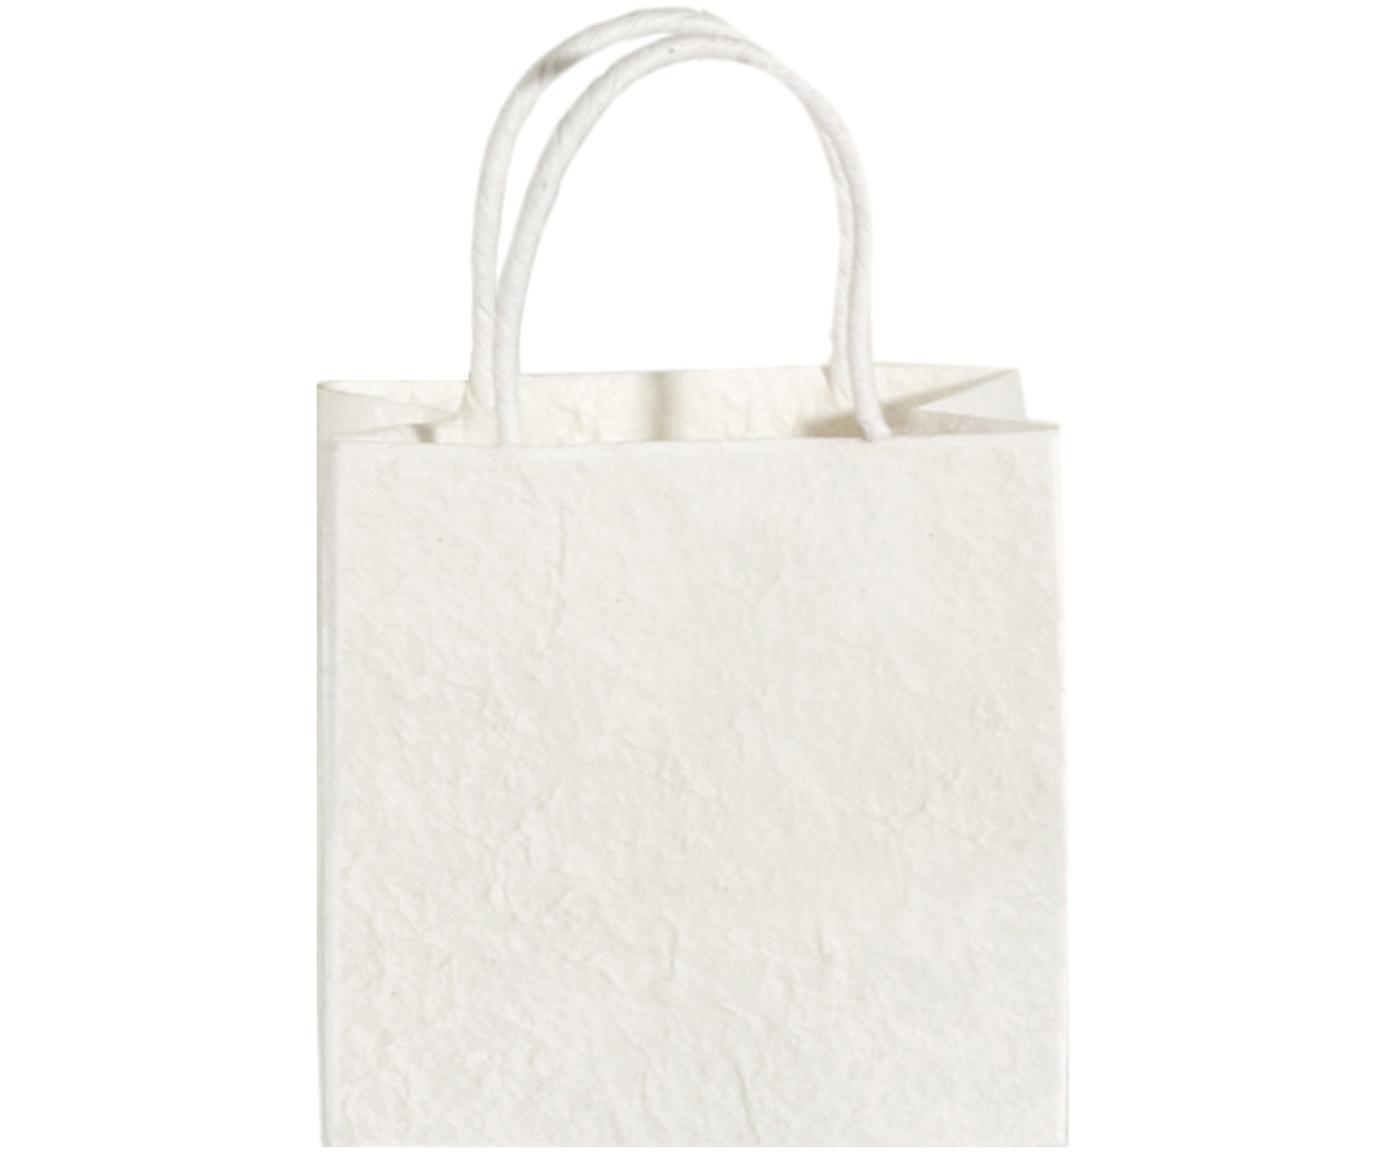 Sacchetti regalo Will, 3 pz., Carta, Bianco, crema, Larg. 20 x Alt. 20 cm